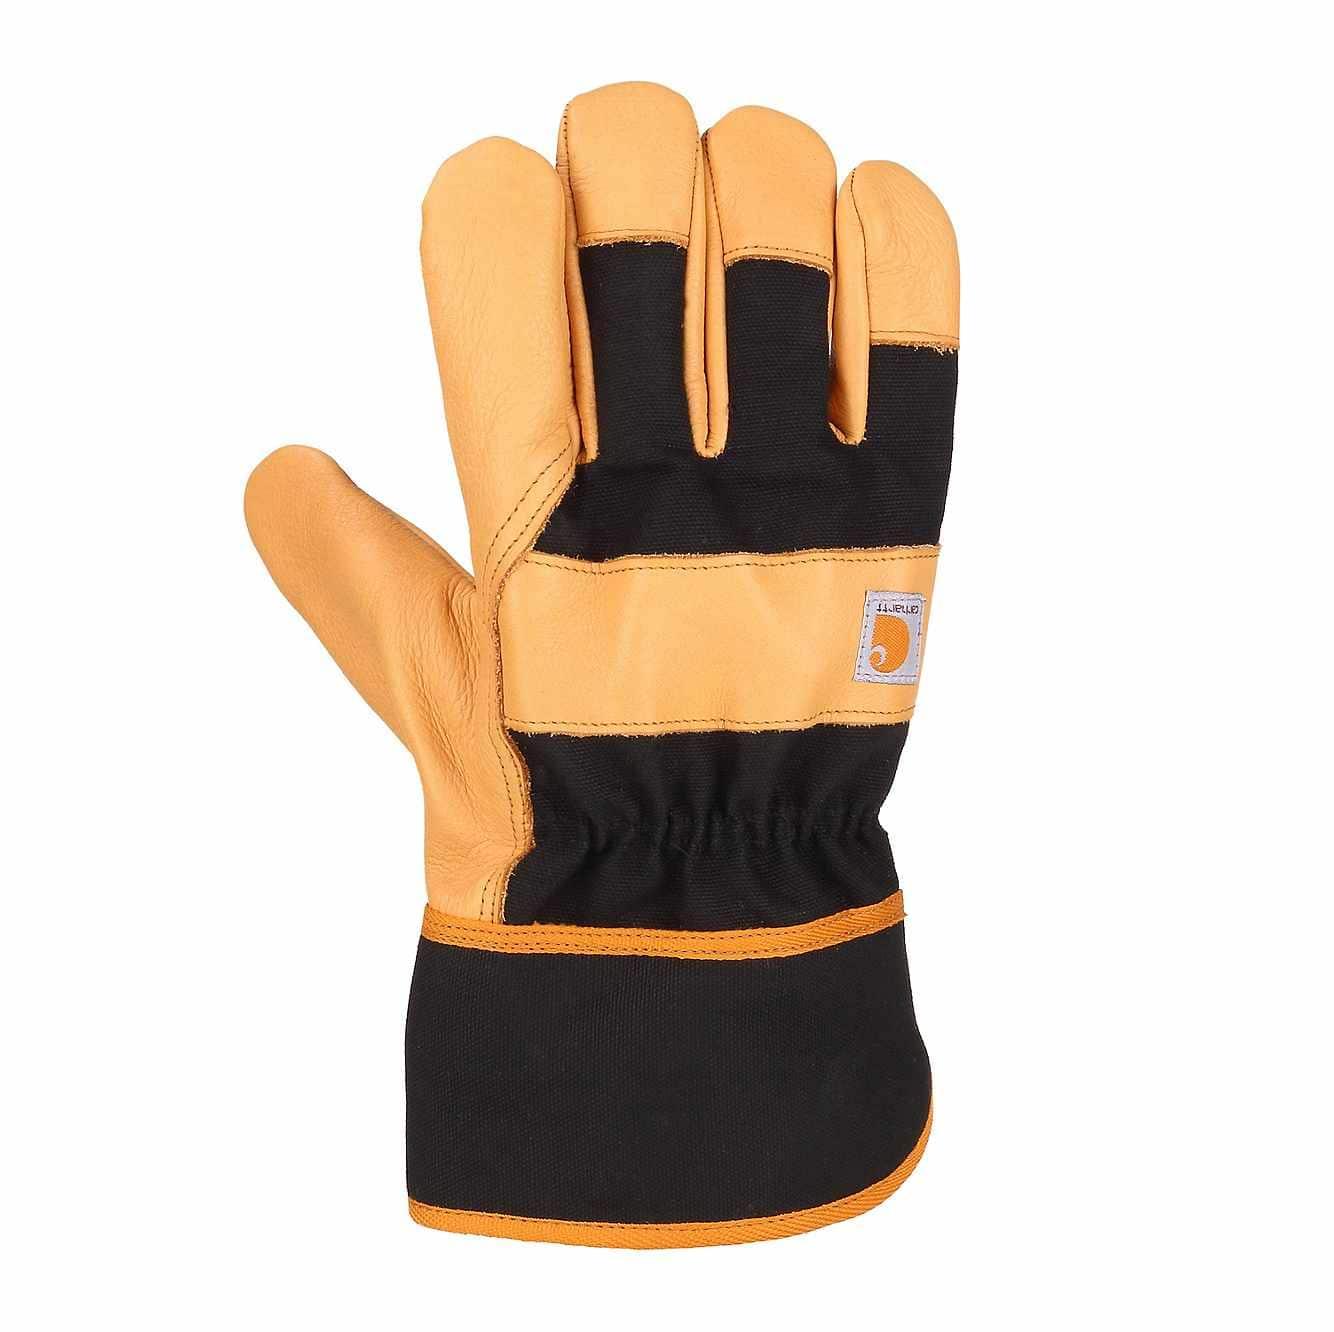 Carhartt Boys Duck Glove